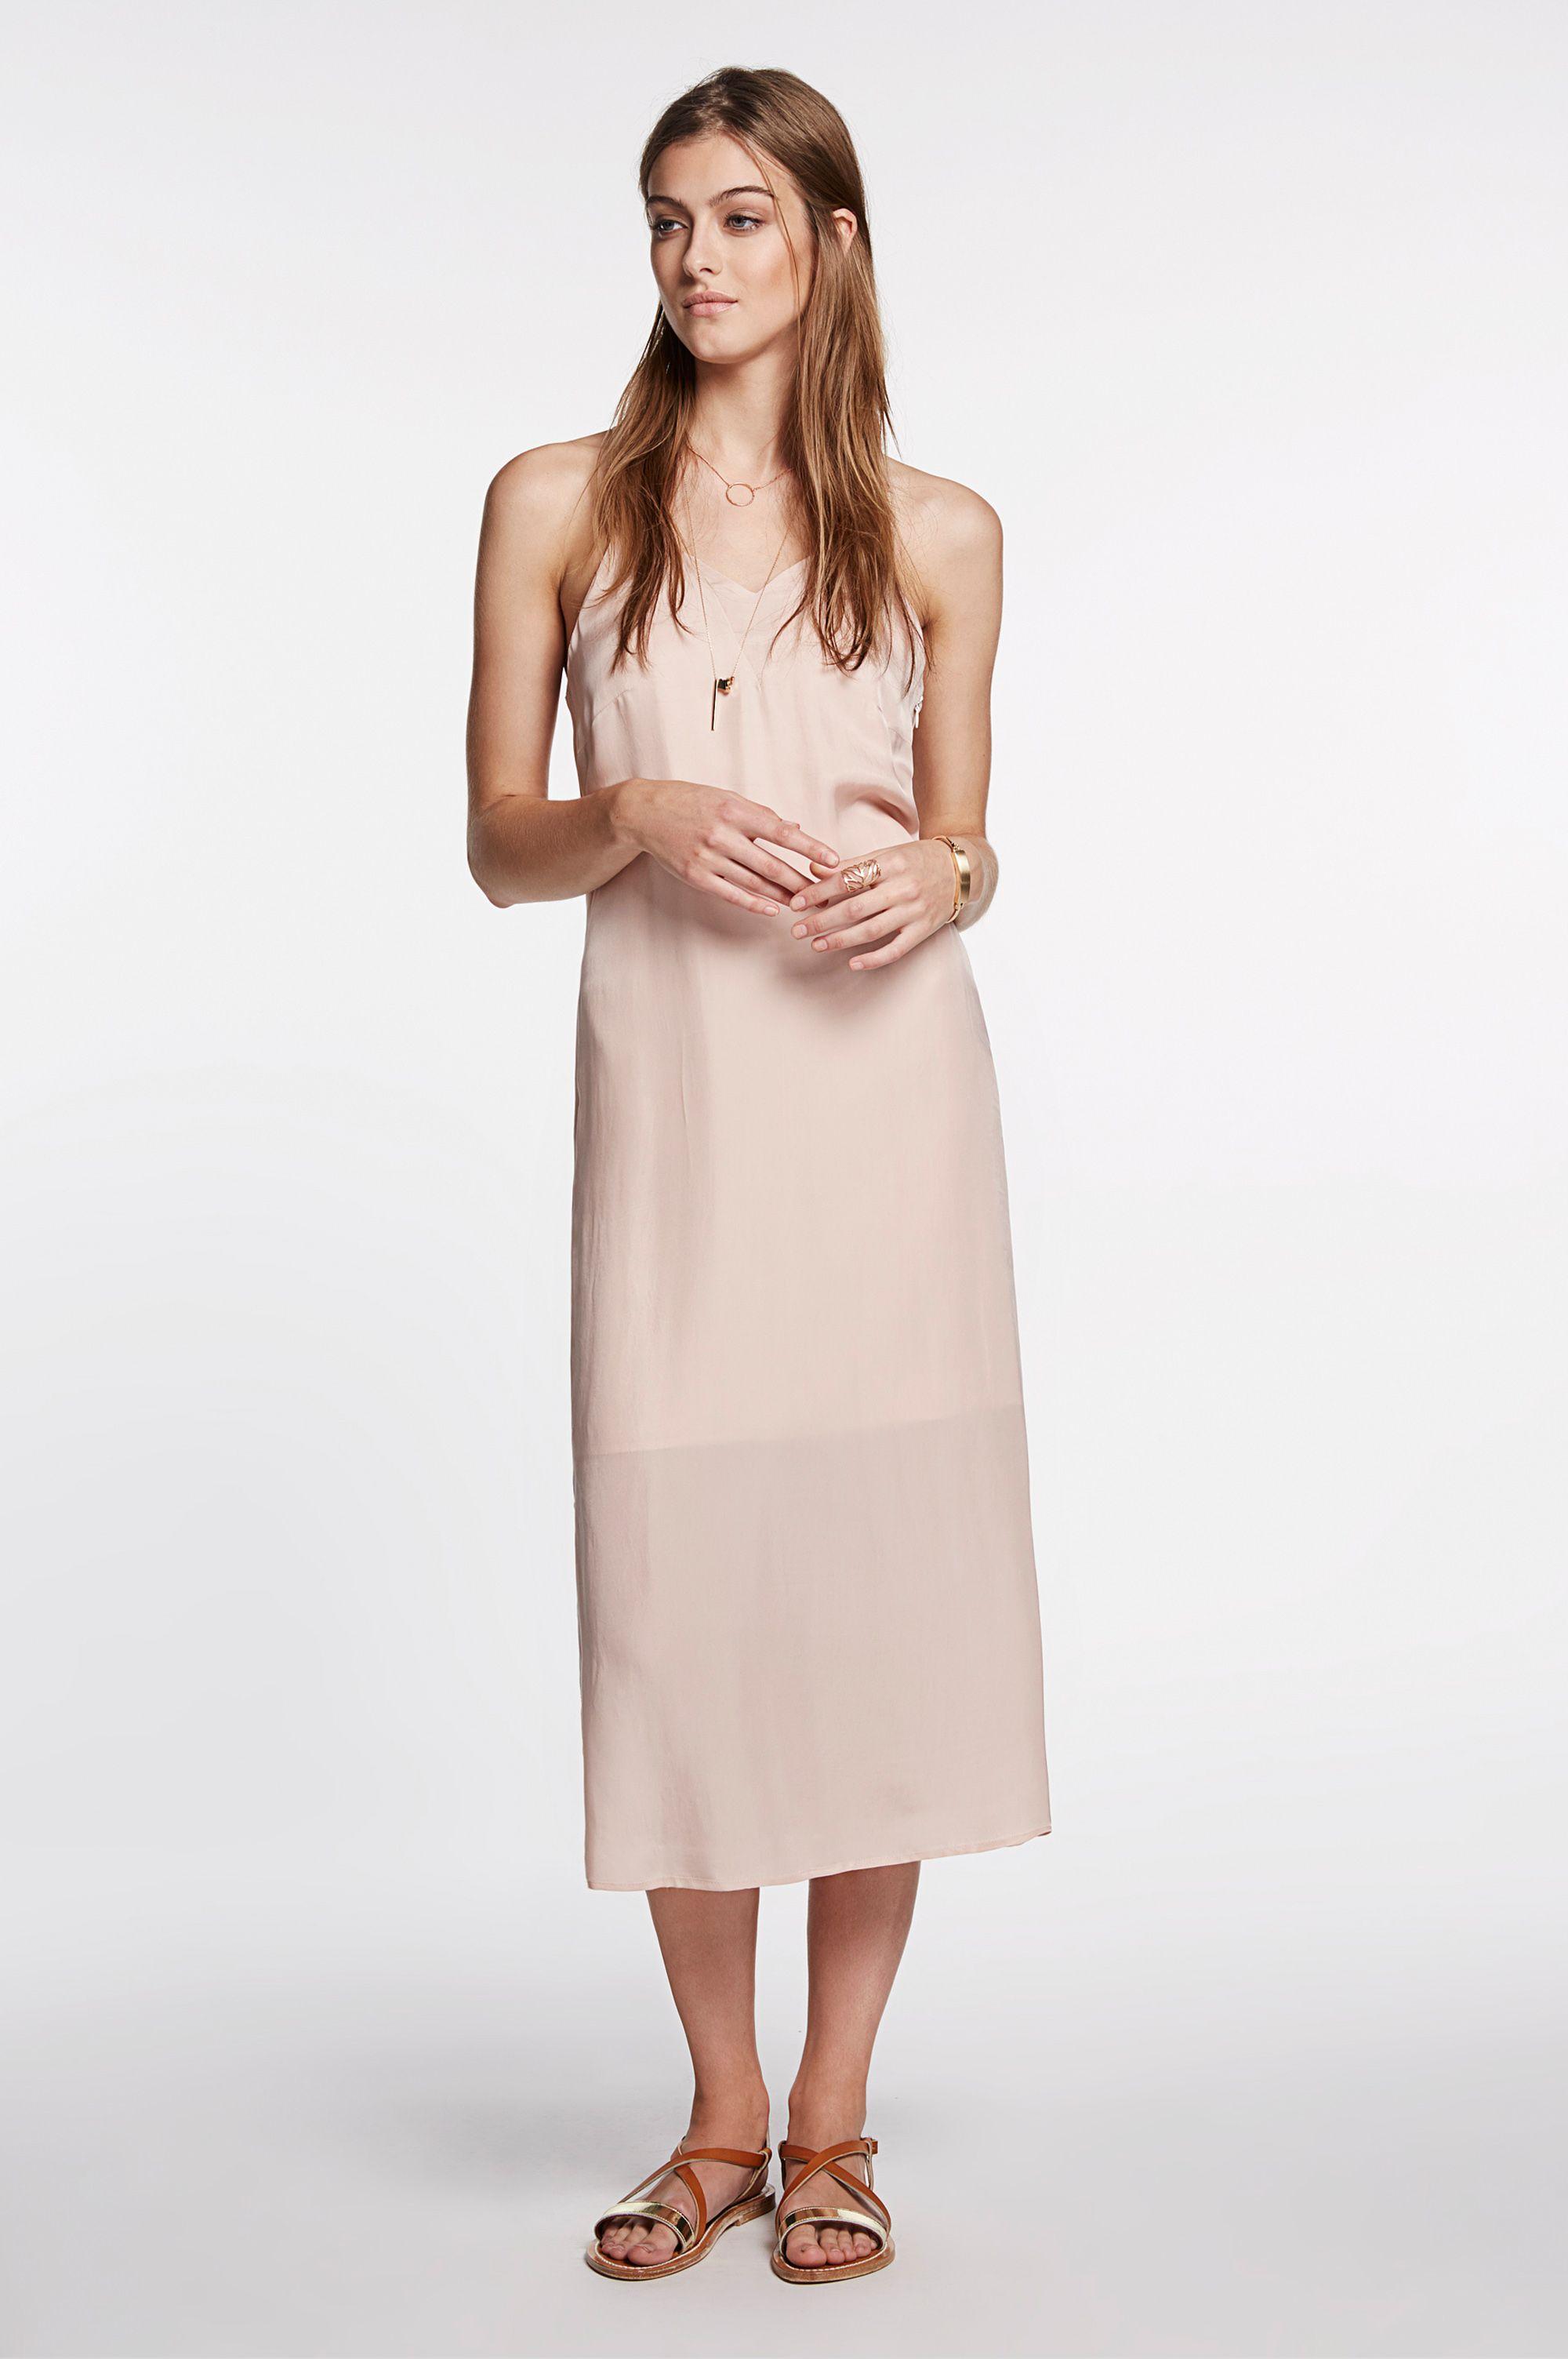 Shop the Look https://www.oui.com/looks/outfit/7ec3917f ...